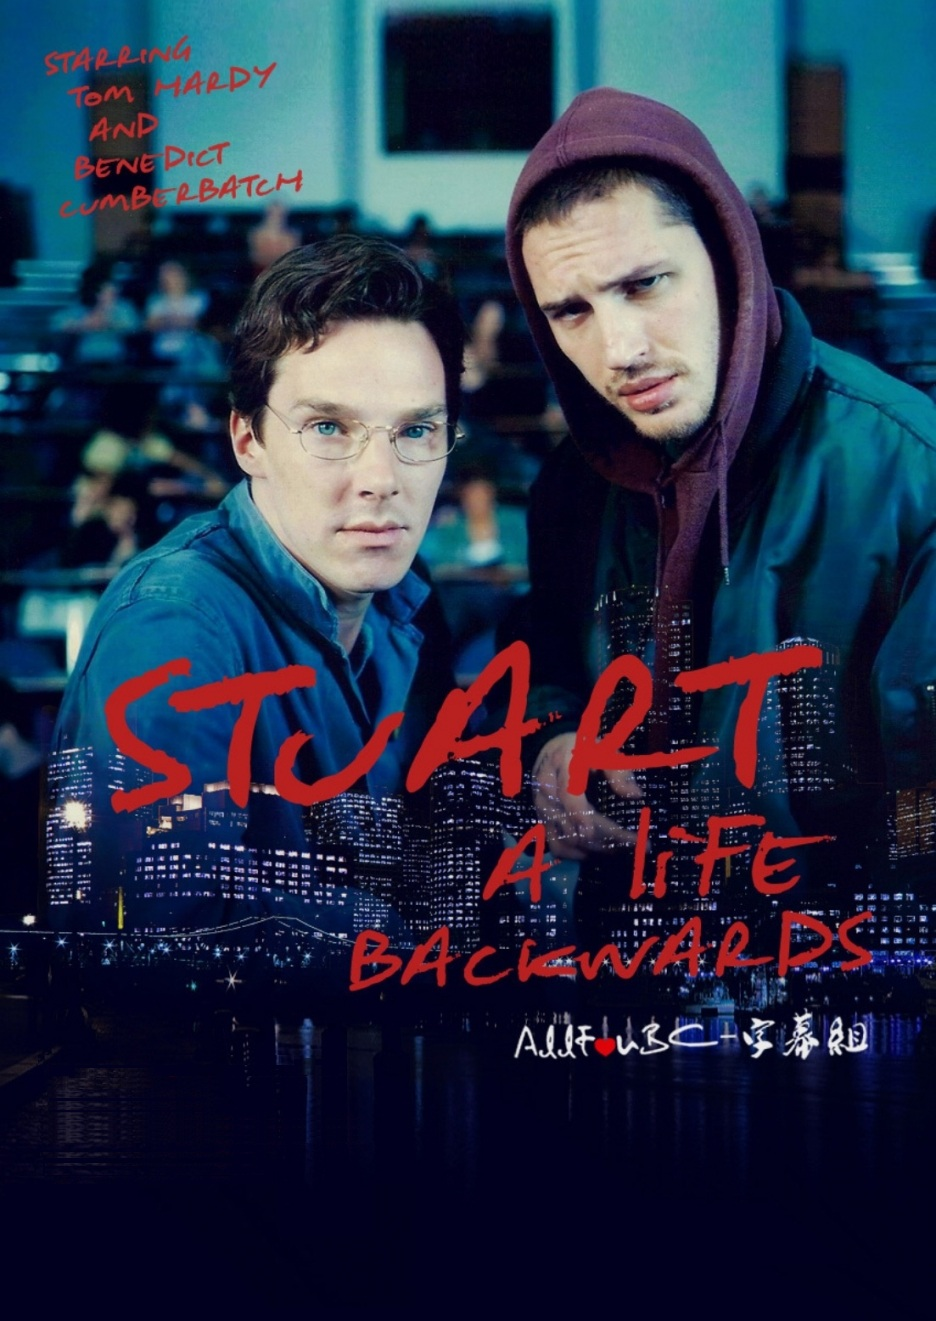 Stuart A Life Backwards